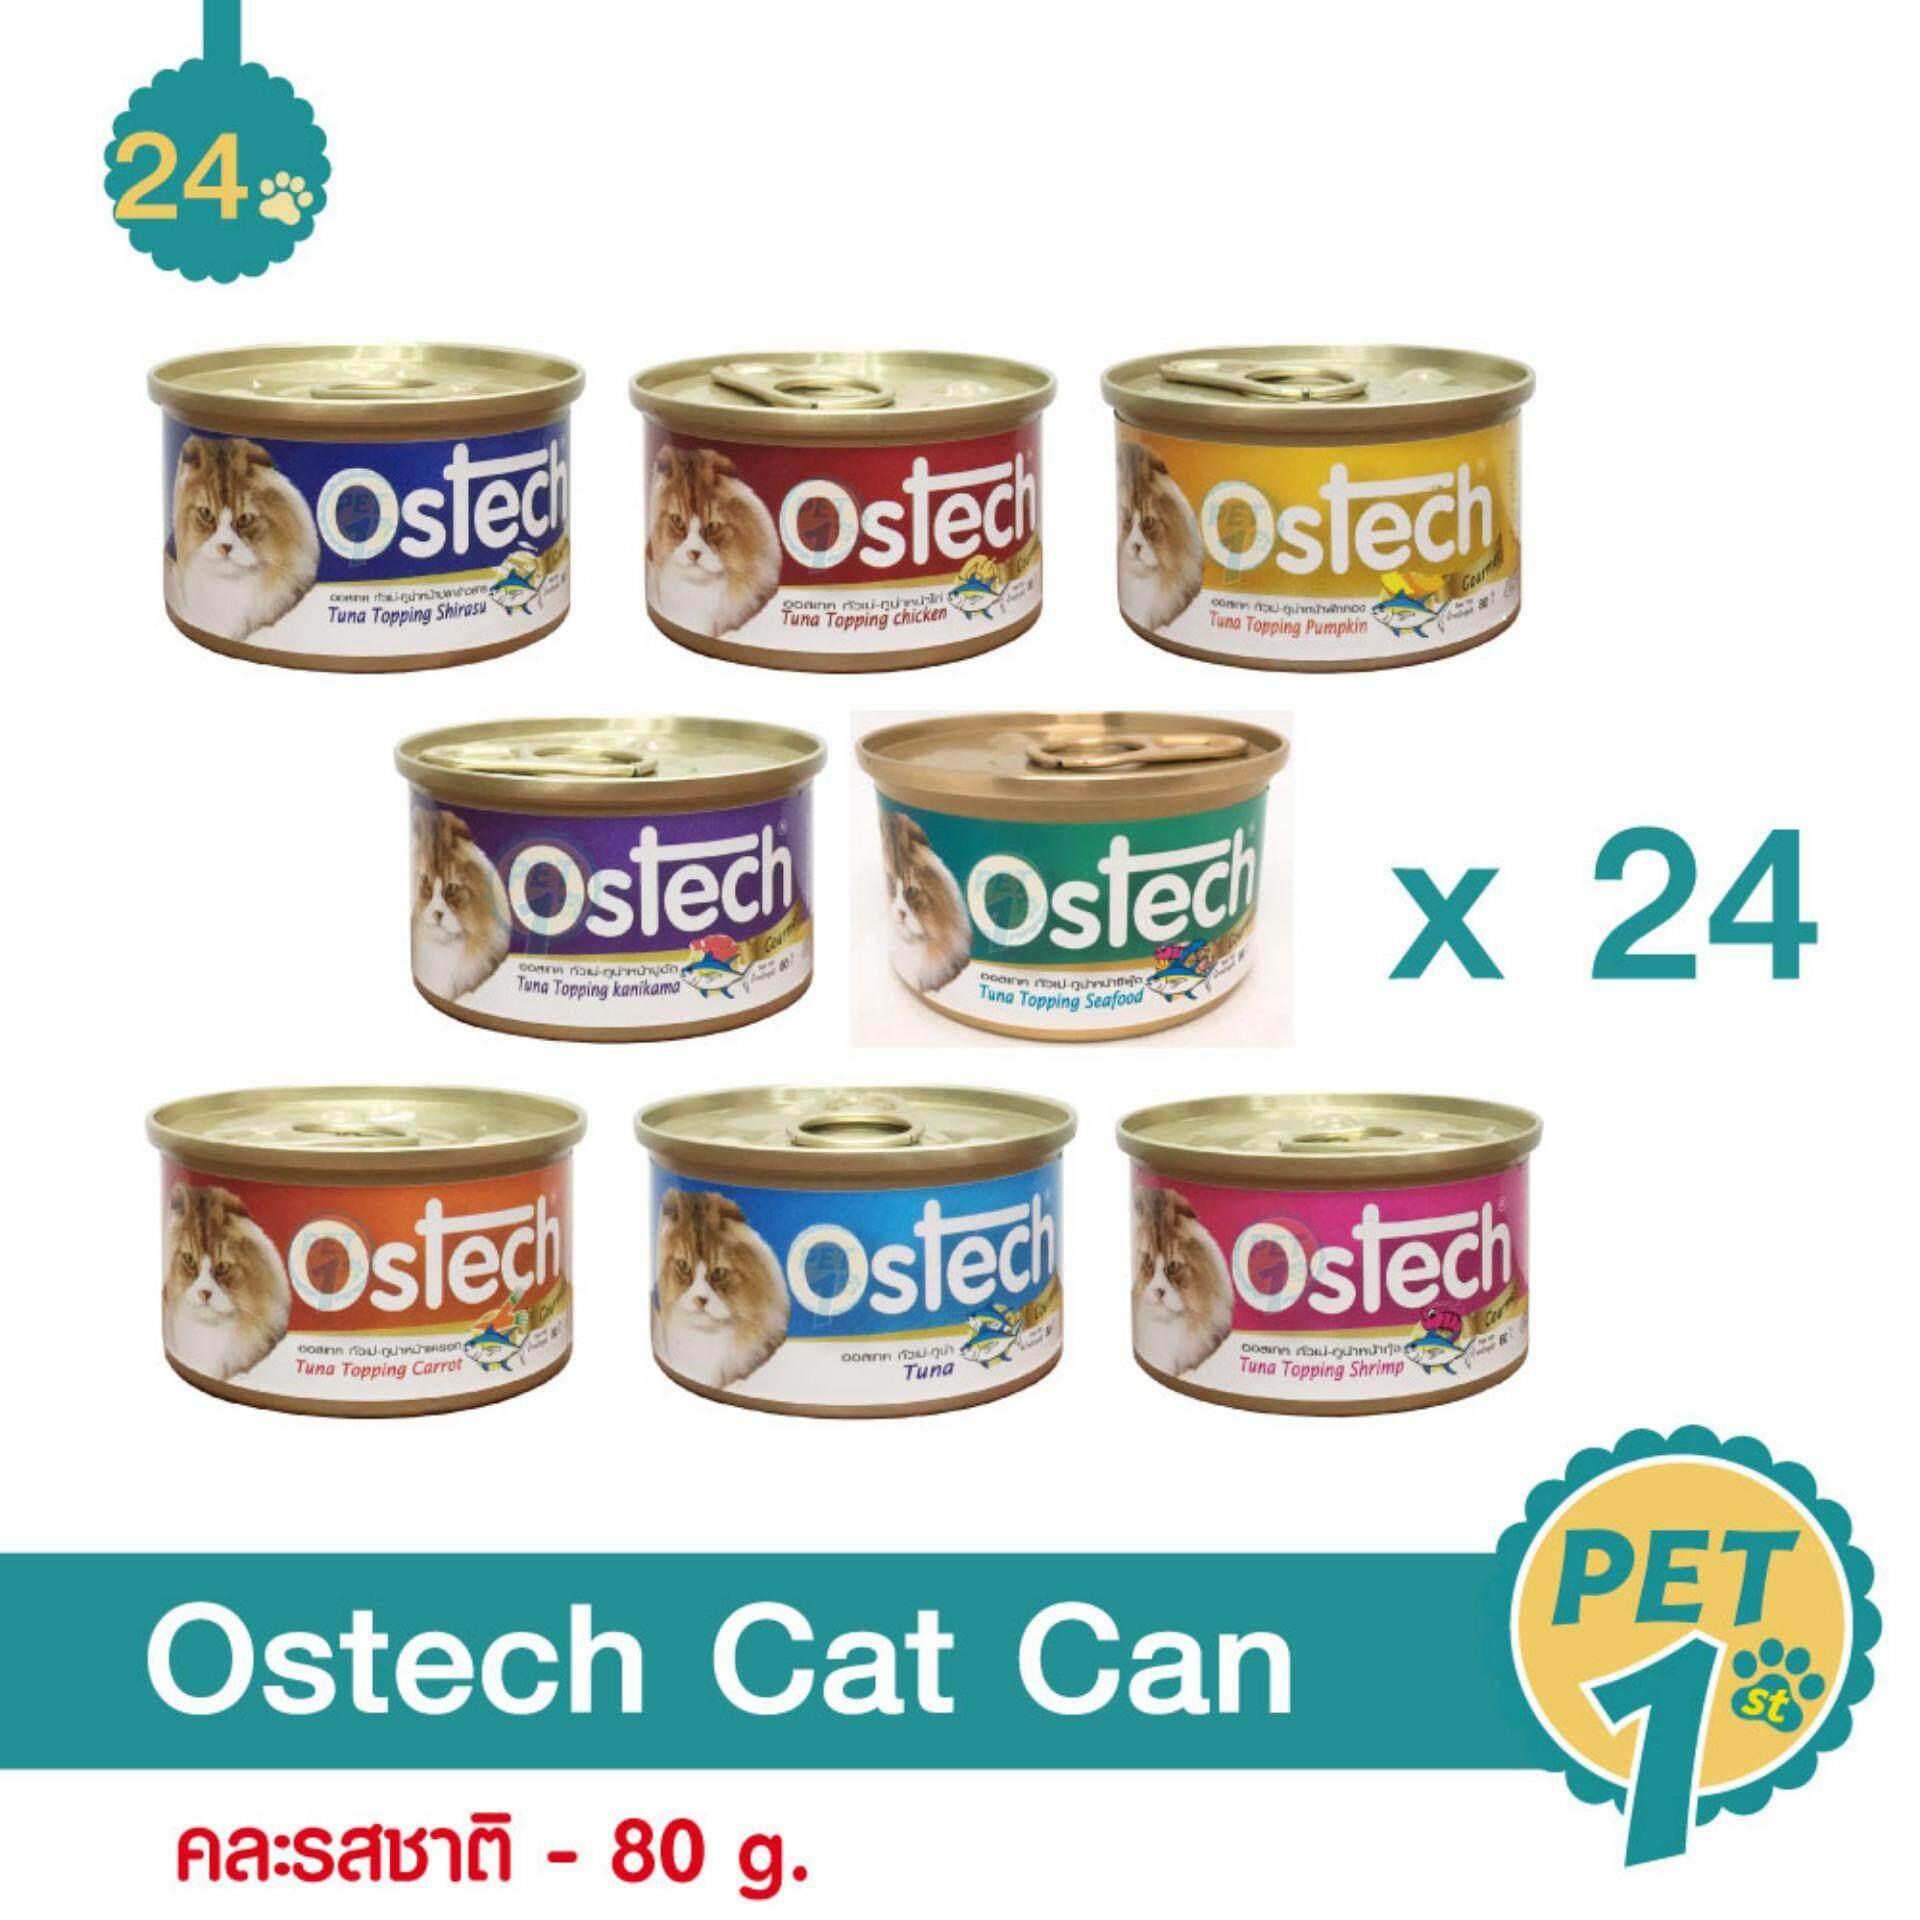 Ostech อาหารเปียก สำหรับแมว 3 เดือนขึ้นไป คละรสชาติ 80 กรัม - 24 กระป๋อง By Pet First.